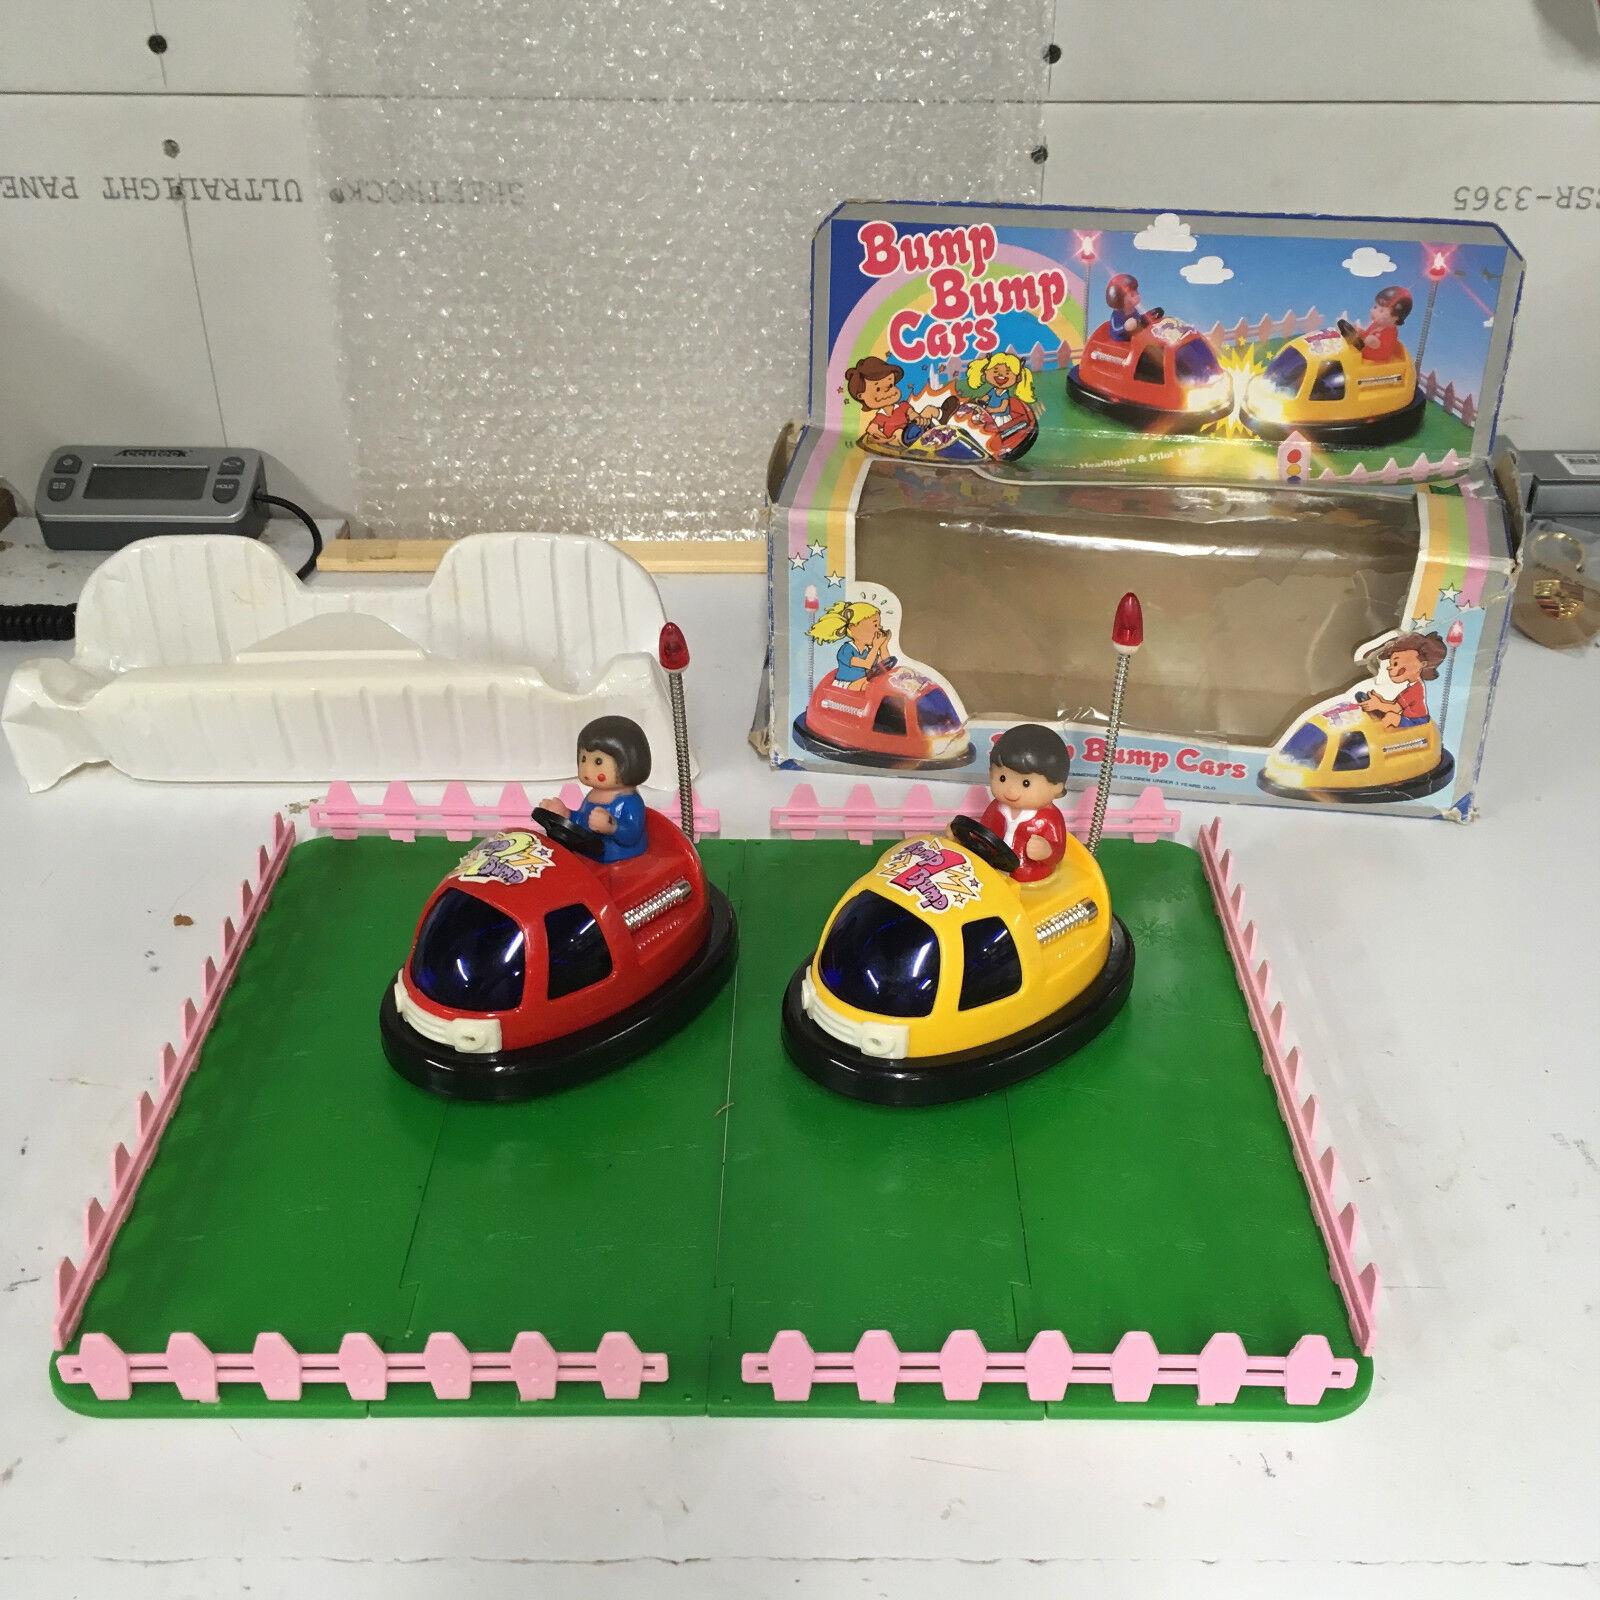 MODERN VINTAGE B O BUMP BUMP CARS BUMPER CARS. COMPLETE WORKING W  ORIGINAL BOX